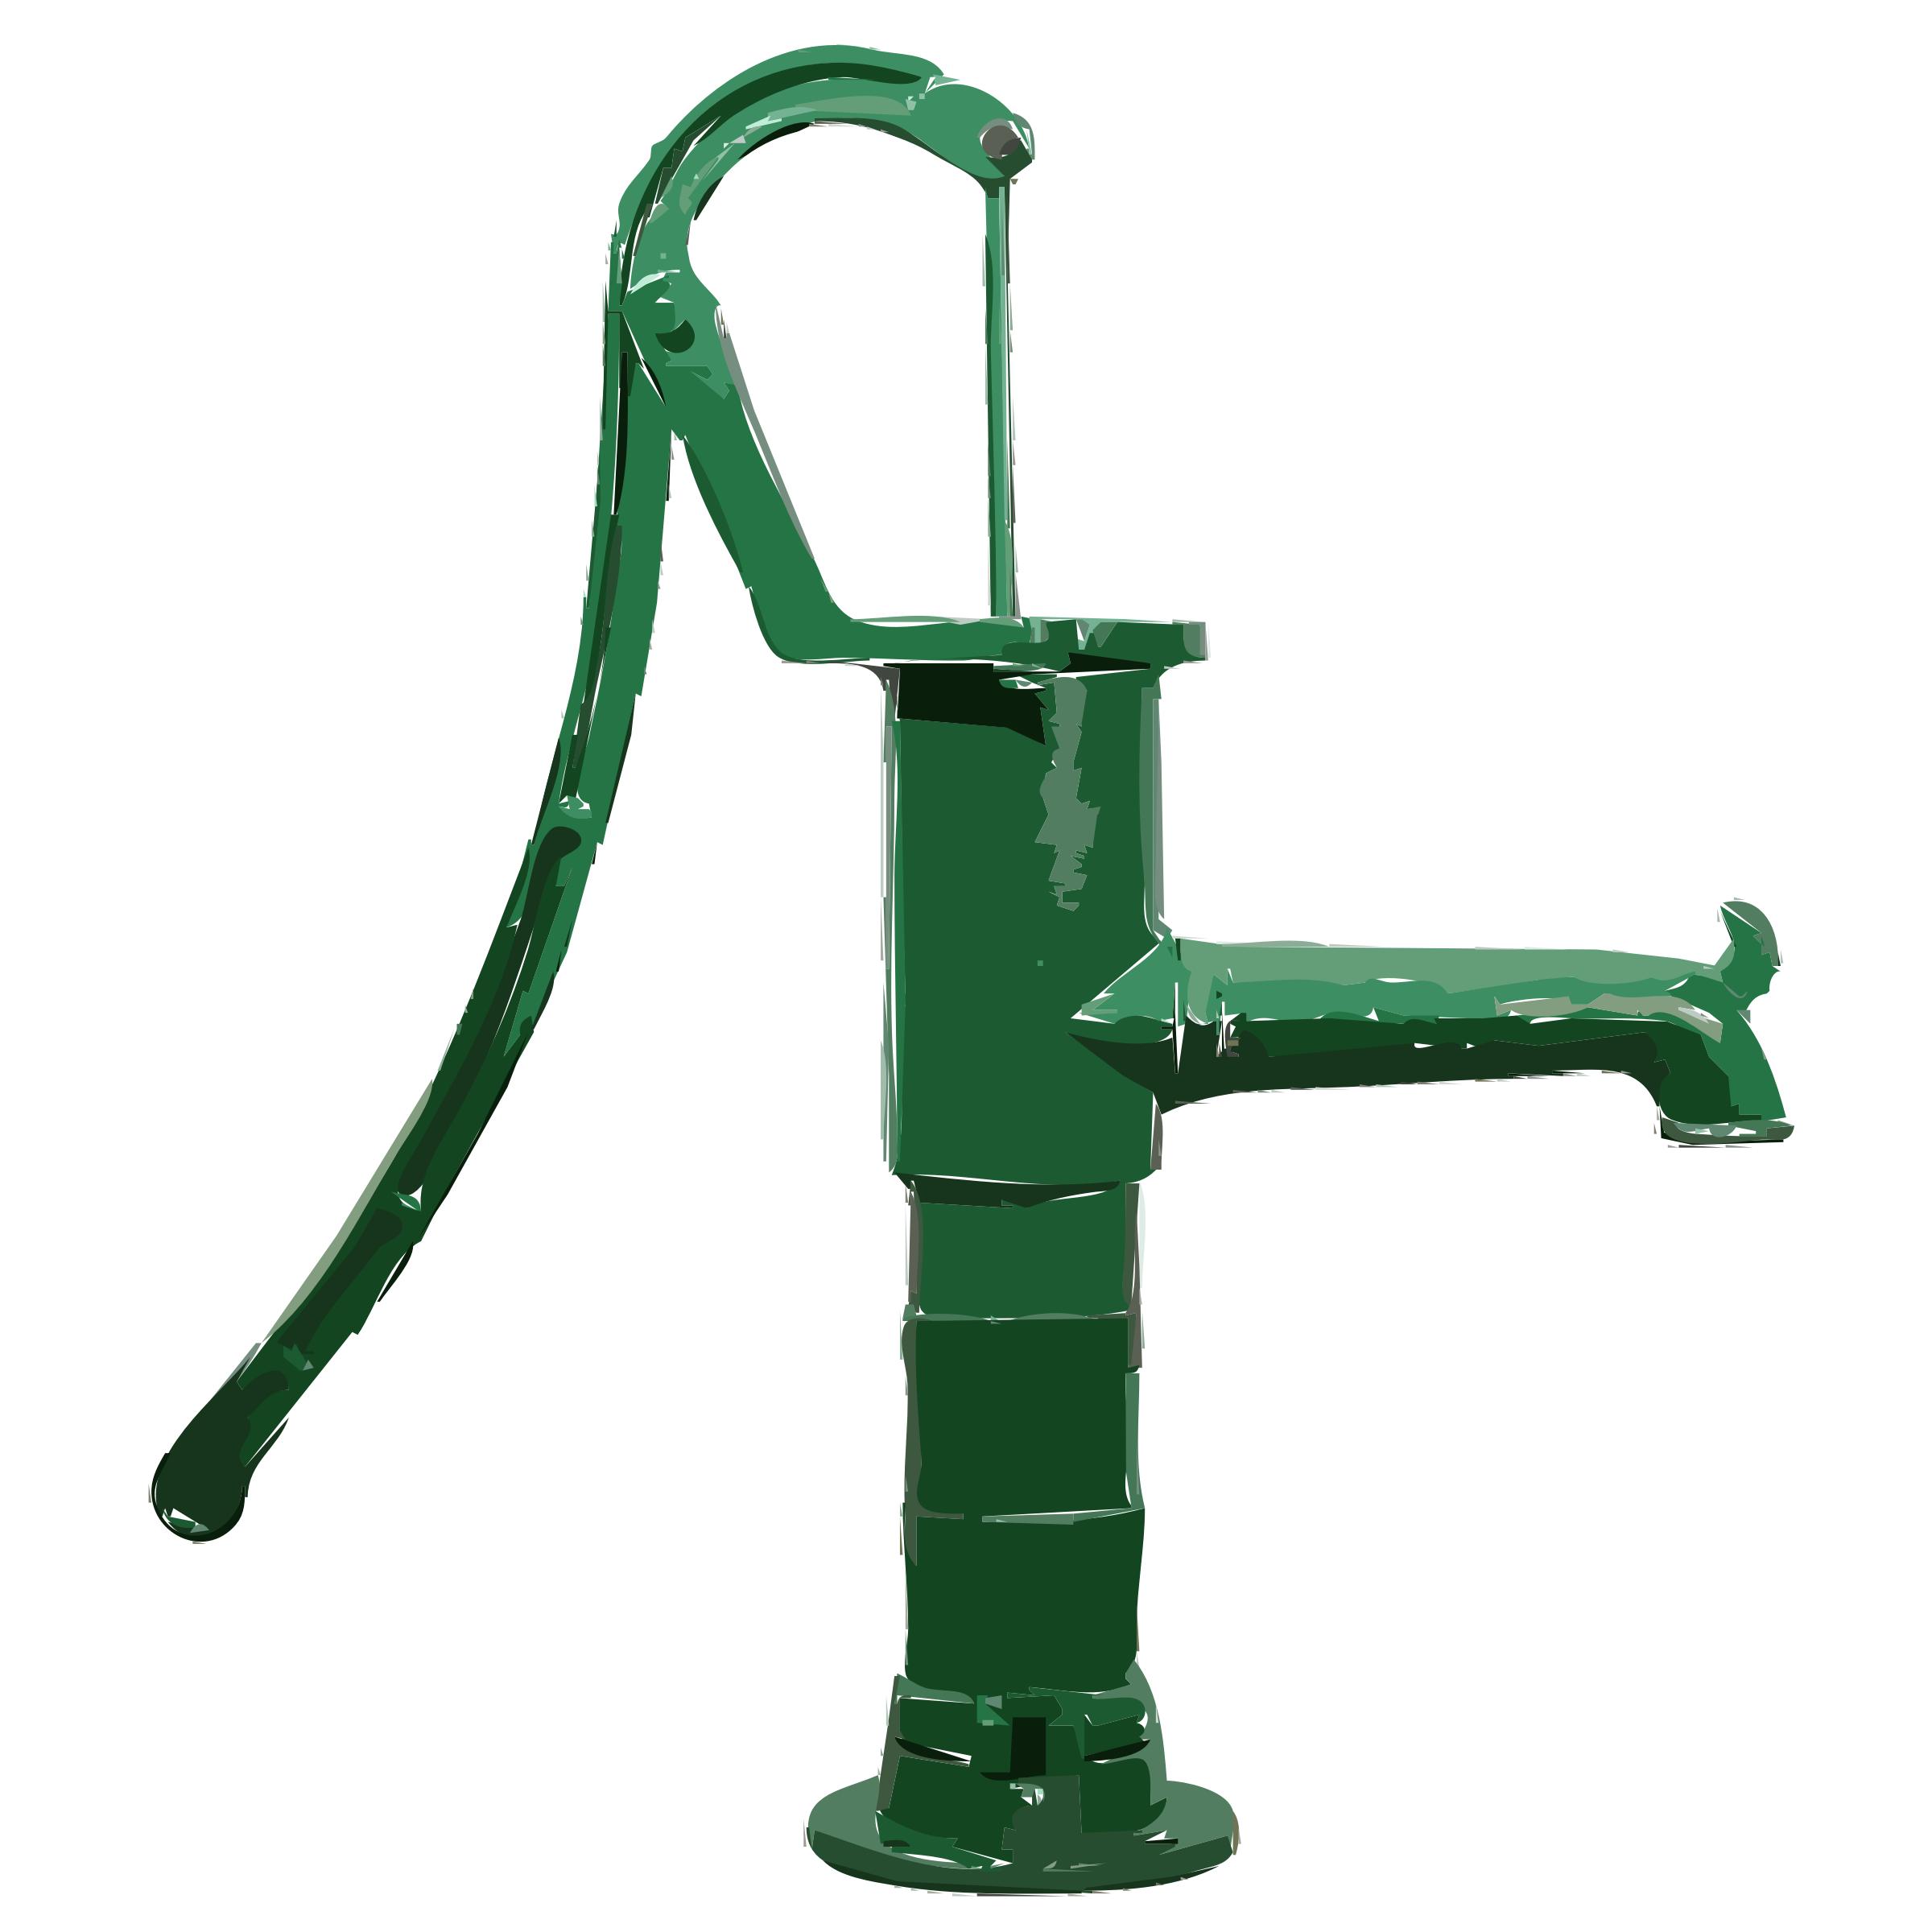 Hand pump clipart clip art transparent stock Free Water Pump Cliparts, Download Free Clip Art, Free Clip Art on ... clip art transparent stock